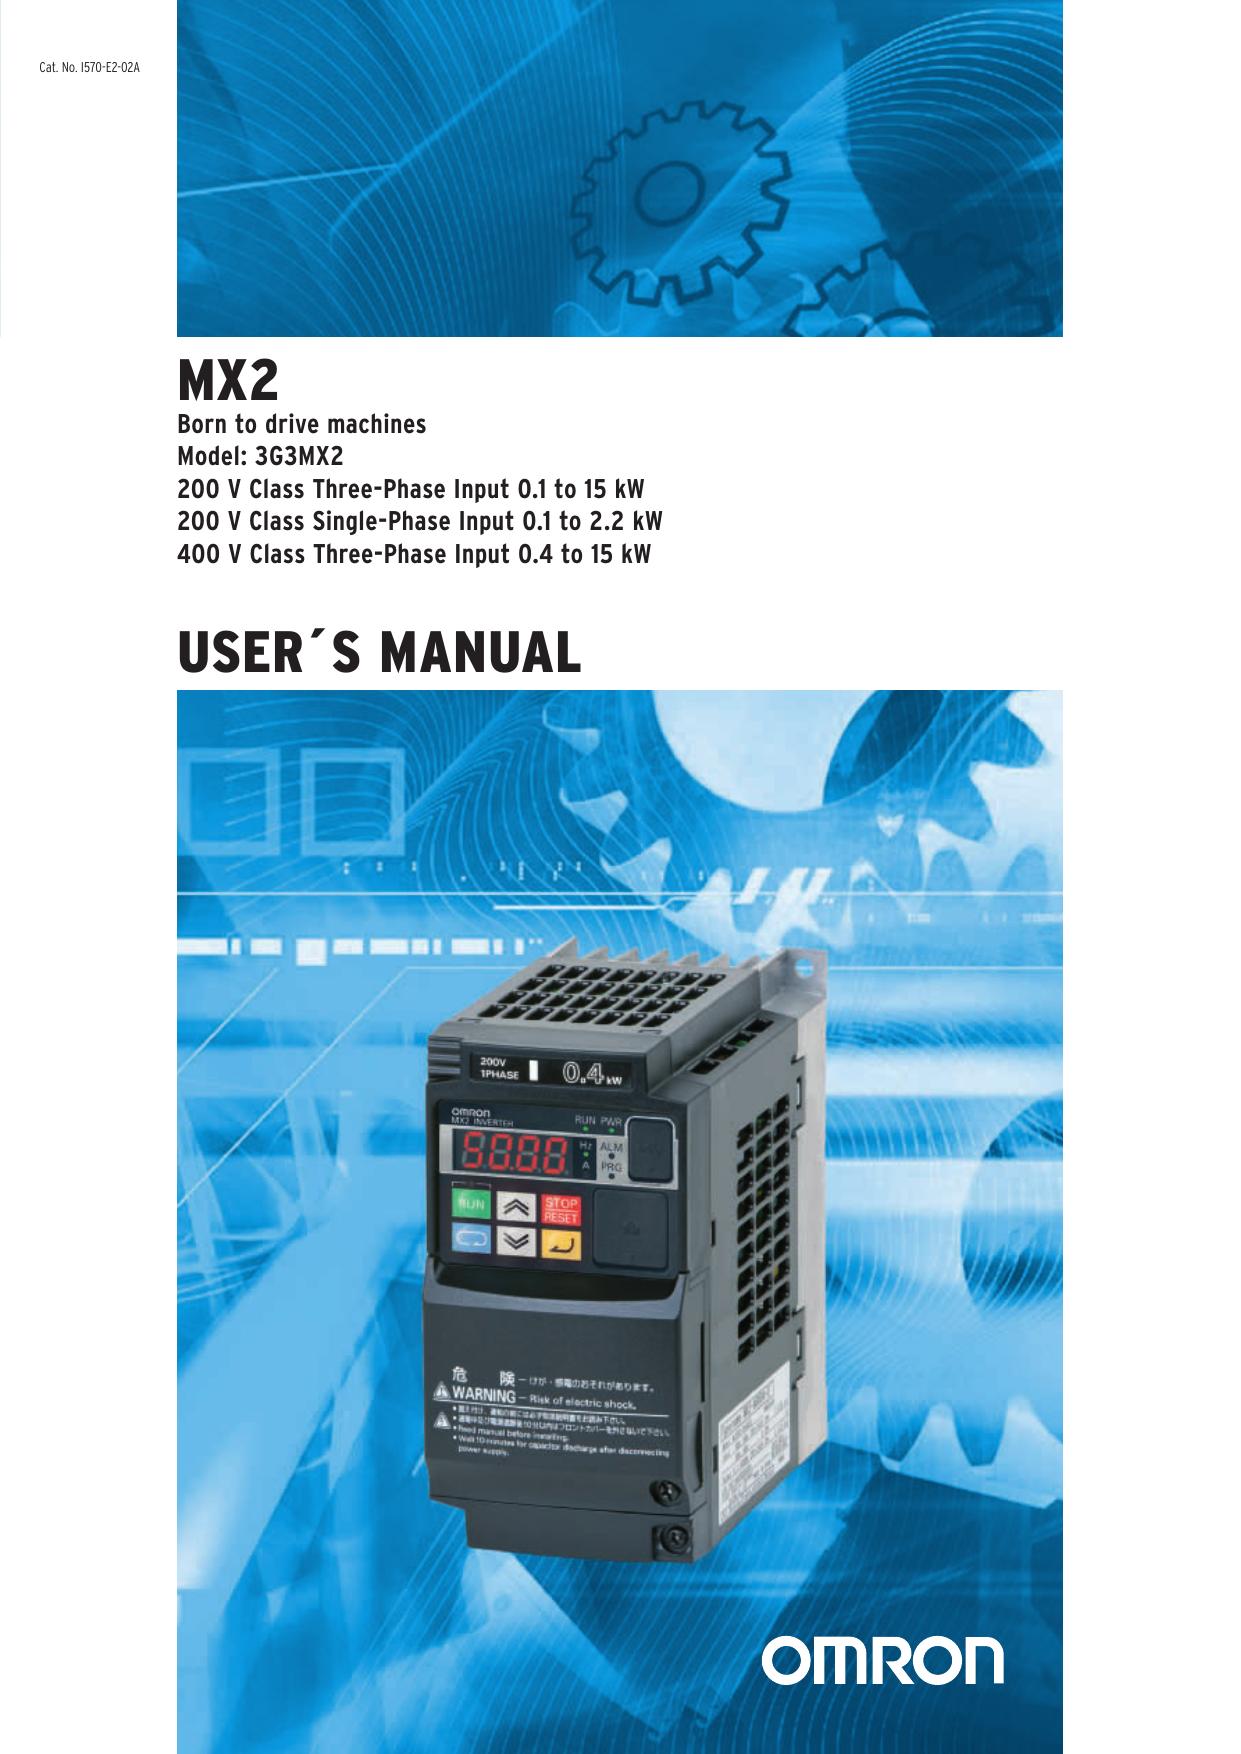 Omron inverter 3G3MX2-AB007-E programming cable+RASMI RFI filter ax-fim1014-re